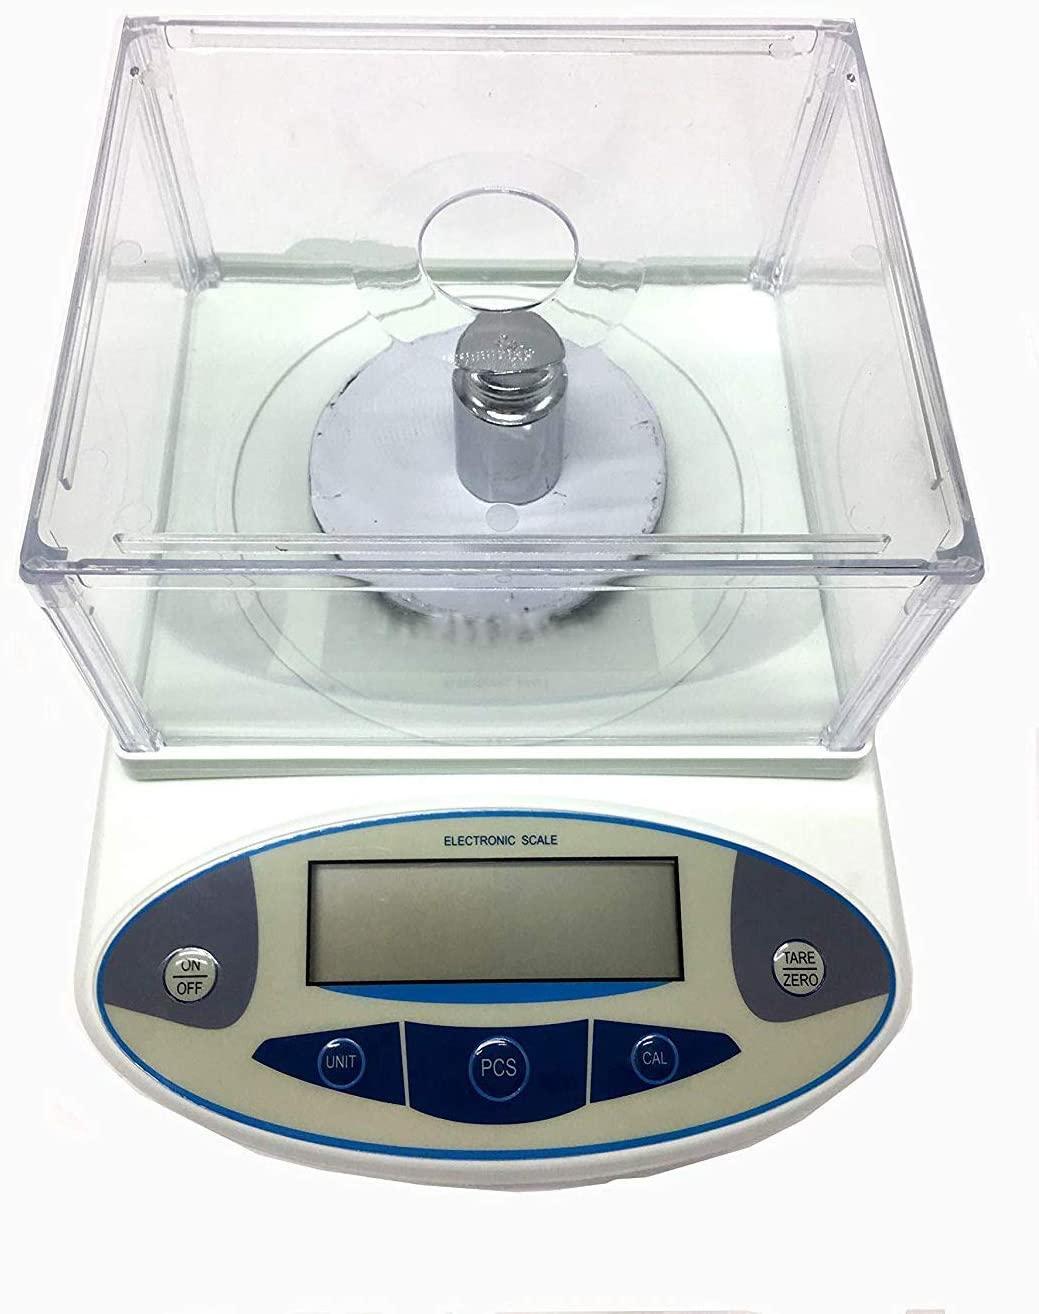 Analytical Balance Lab Laboratory Digital Scale 100g x0.001g 1 mg Precision Balances (100g, 220v)